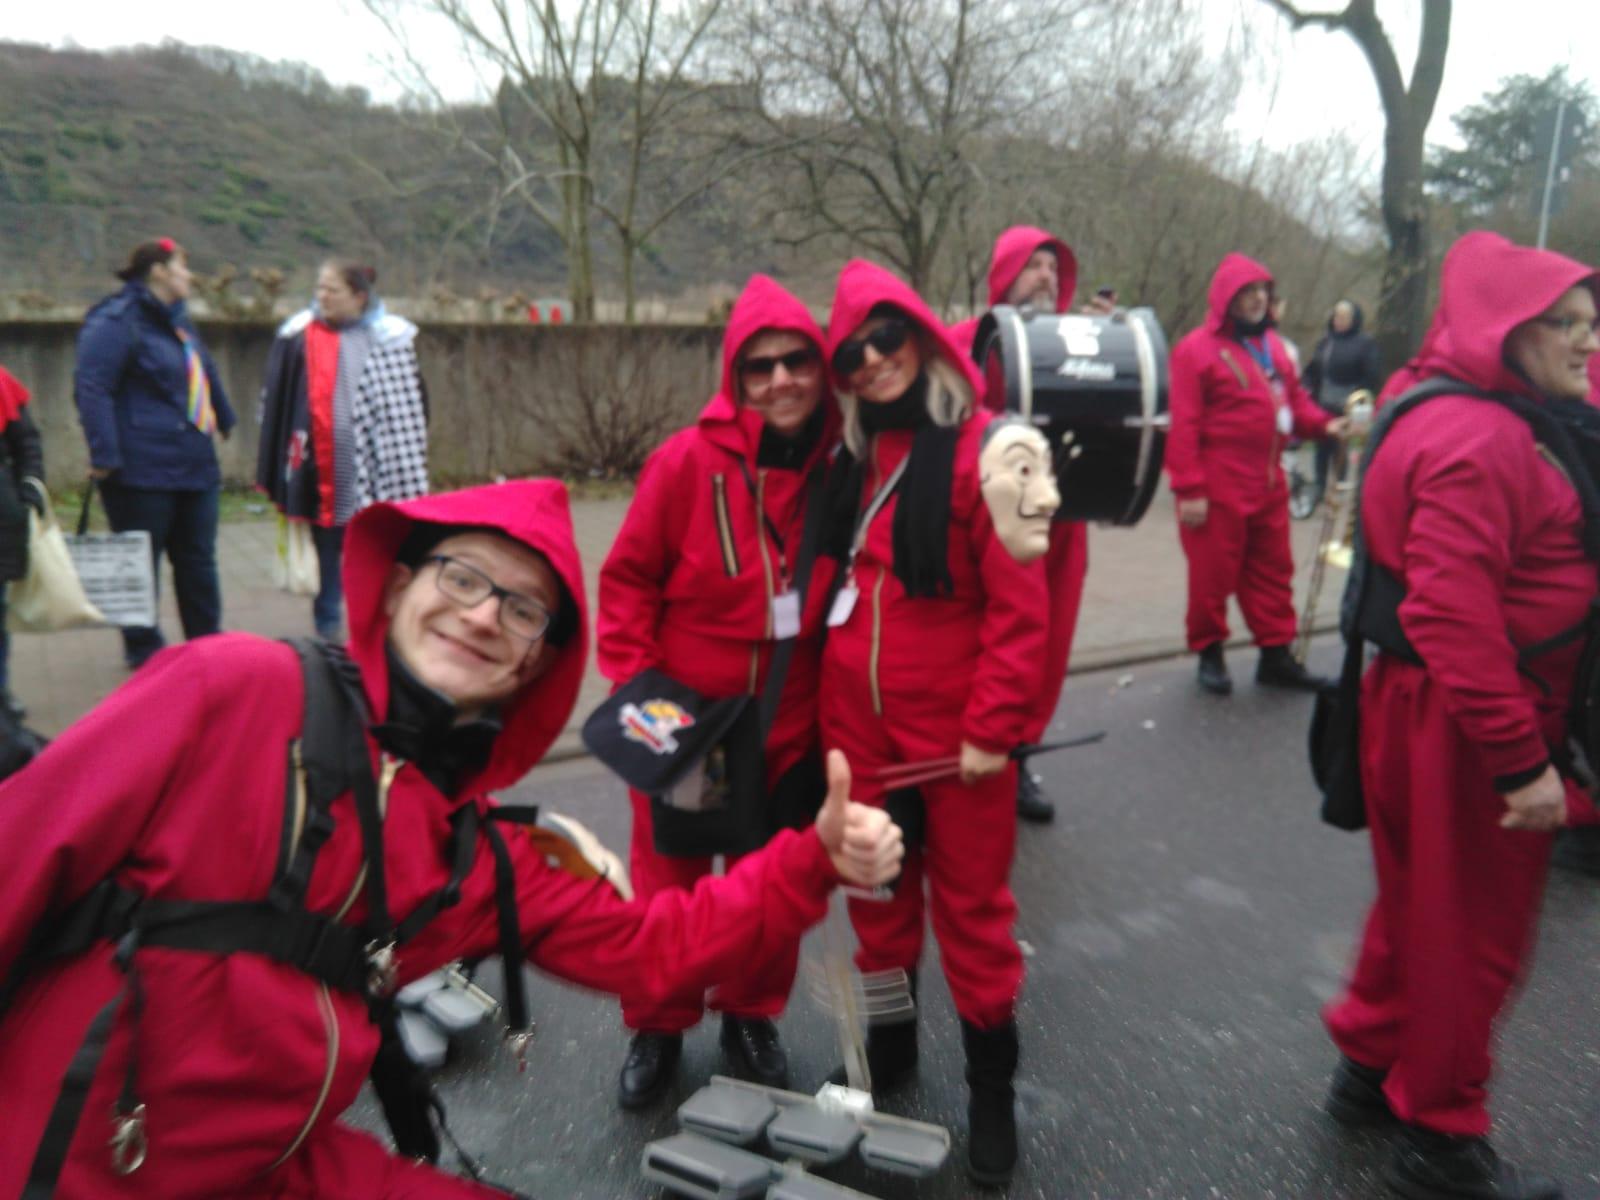 NoName-Guggen-Andernach-2020-Karneval-109